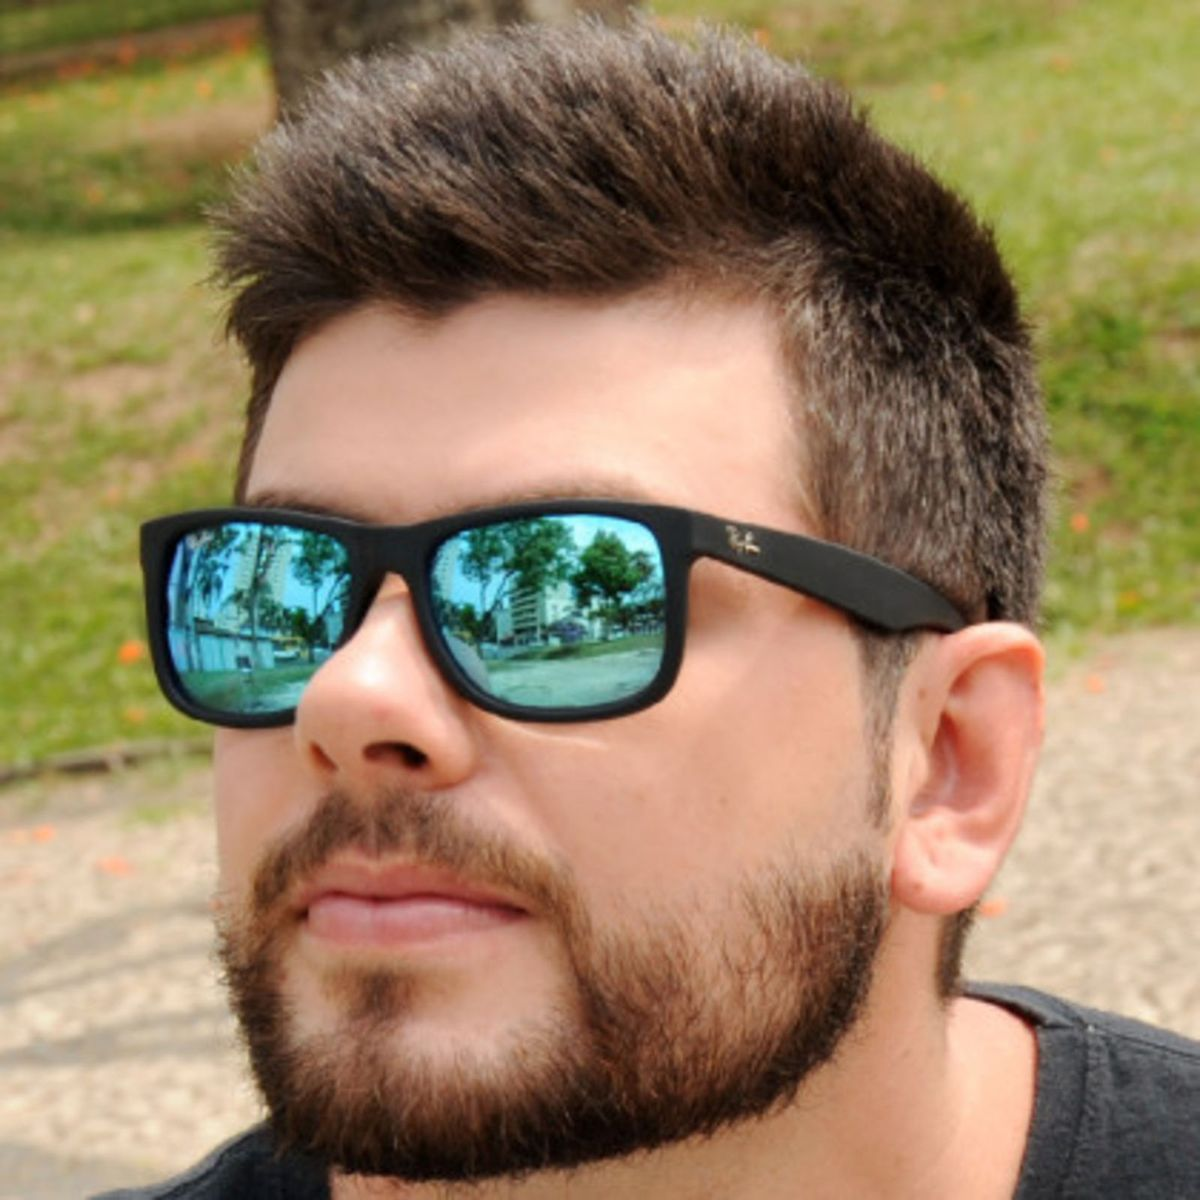 óculos de sol justin 4165 ray-ban espelhado azul masculino e feminino. -  óculos 2c44f04374